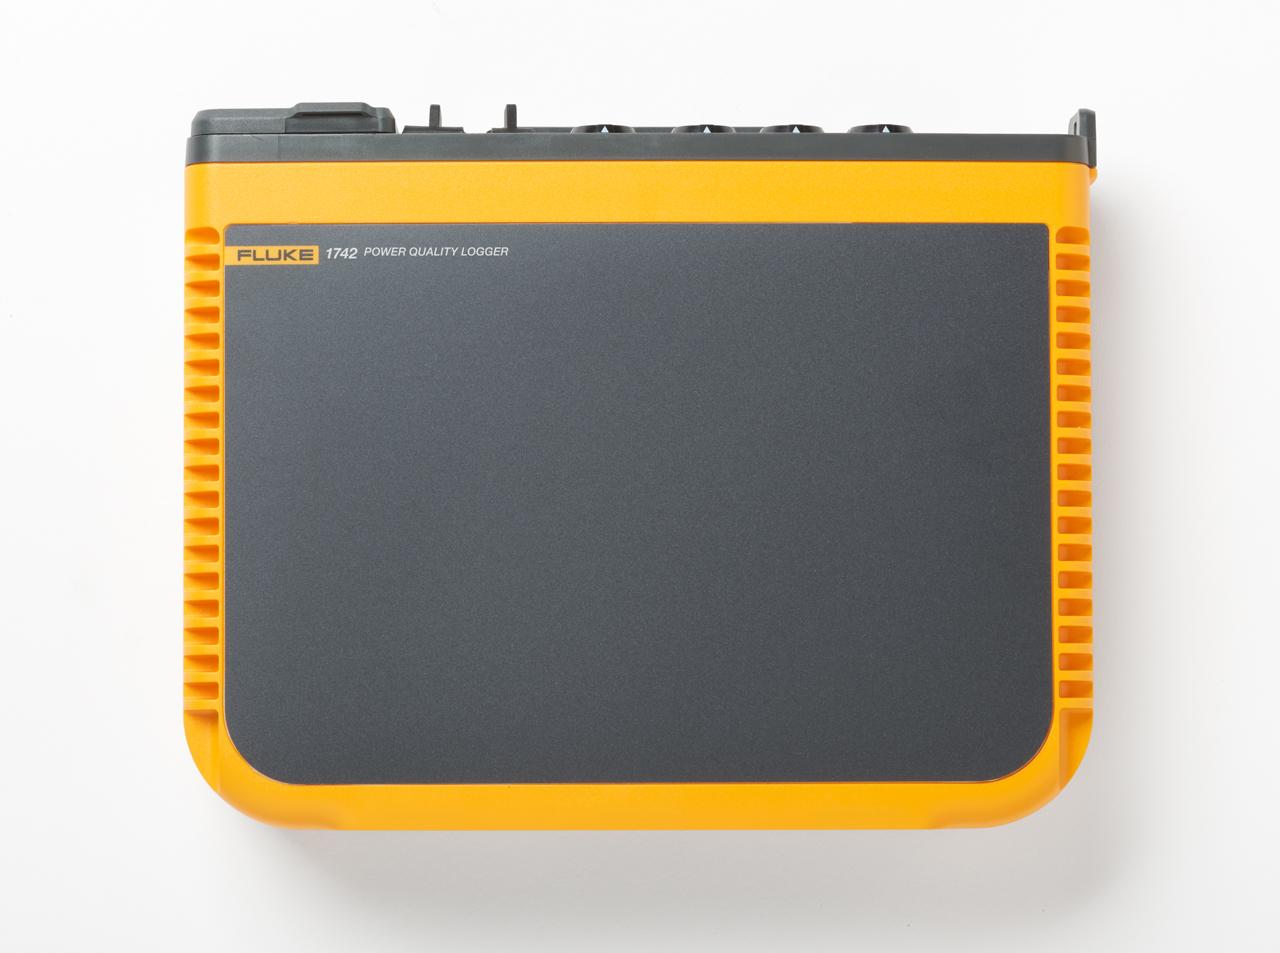 FLUKE 1742-15-INTL - Power Quality Logger w/60cm 1,500A iFLex, INTL